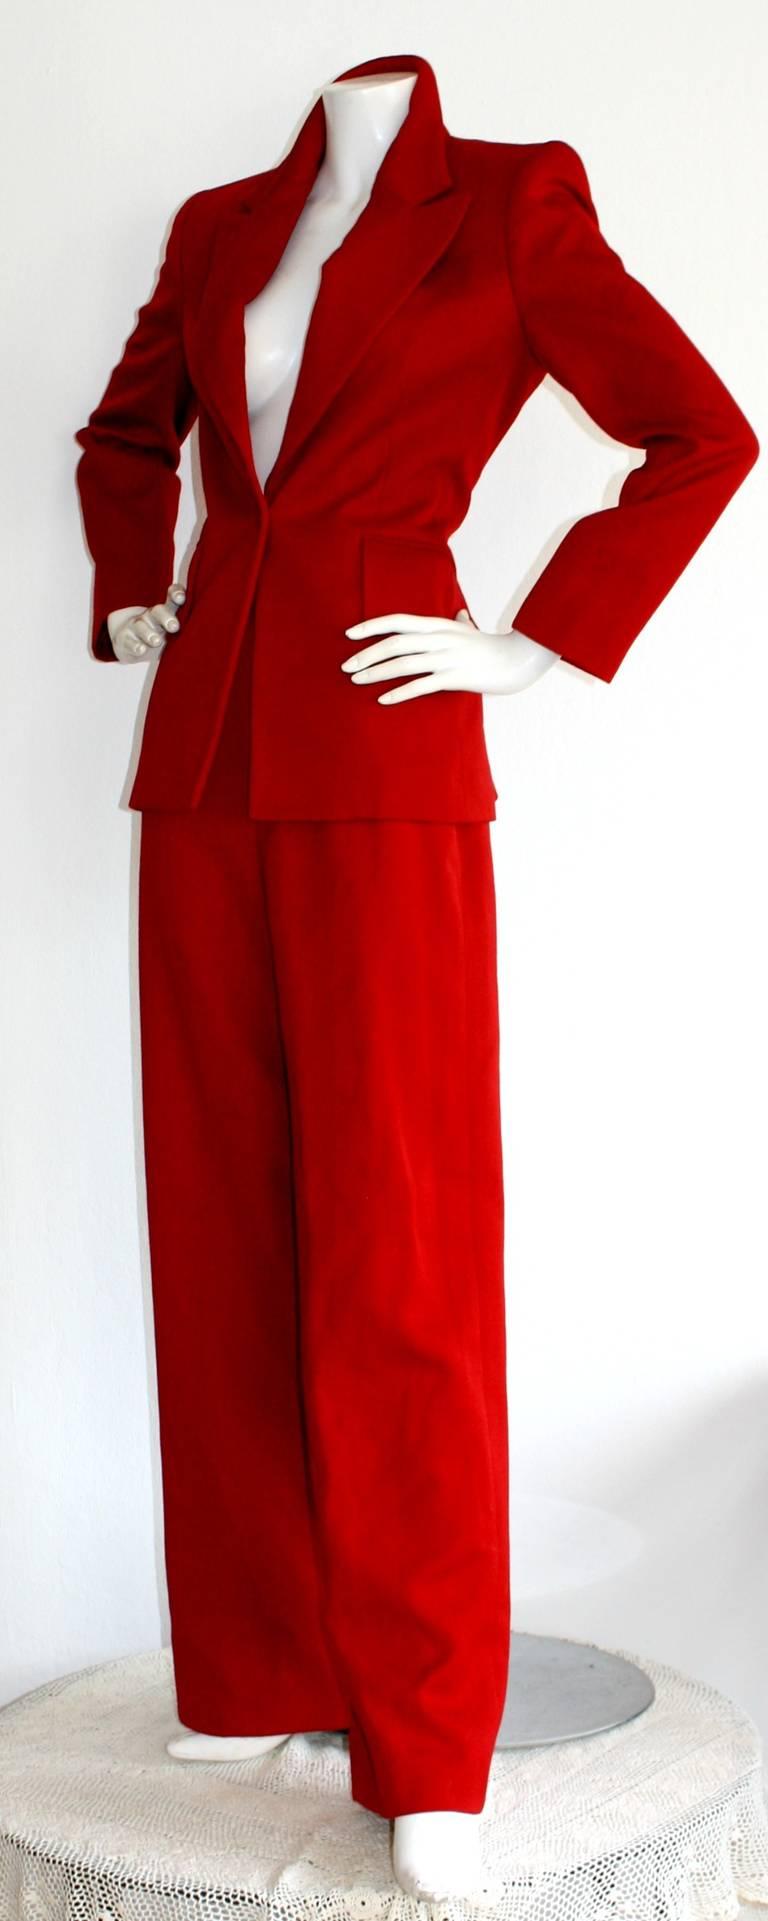 Isaac Mizrahi Vintage Lipstick Red Holiday Le Smoking Suit 4